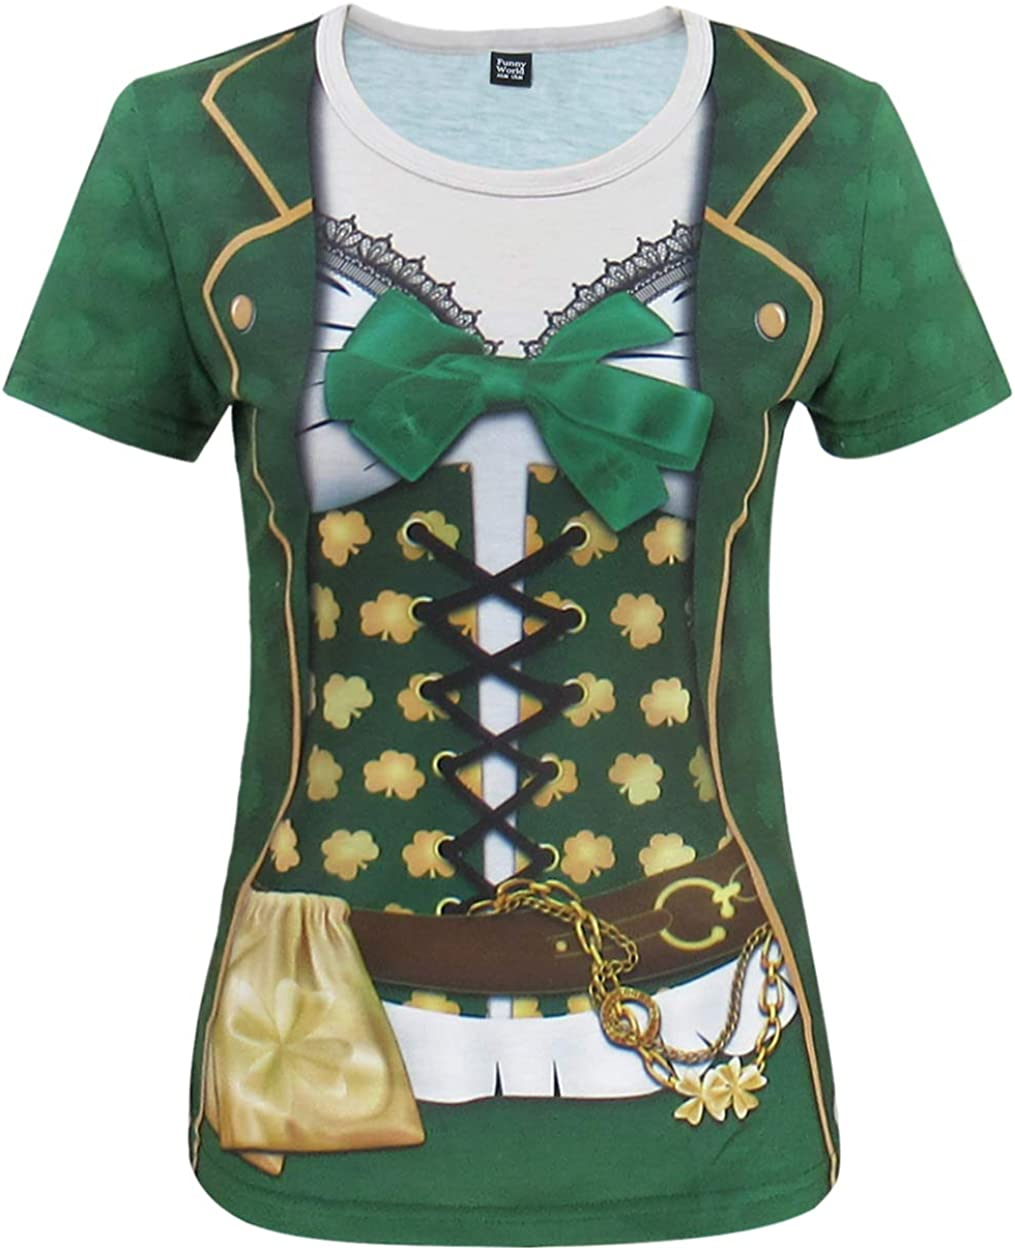 Funny World St. Patrick's Day Women's Leprechaun Costume Clover T-Shirts